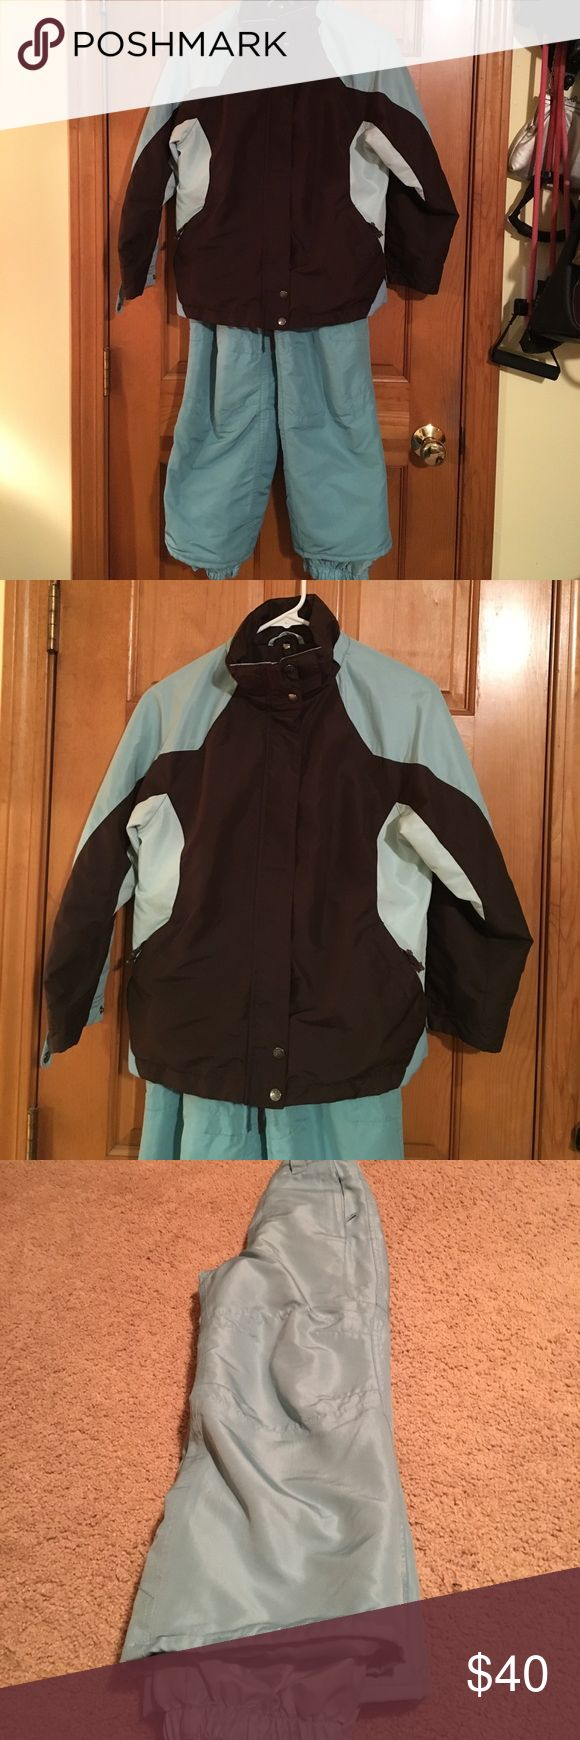 Girls Ski Jacket & Ski Pants Light Blue & Chocolate Brown Ski Jacket & Ski Pants set used twice! In mint condition! Cherokee Matching Sets